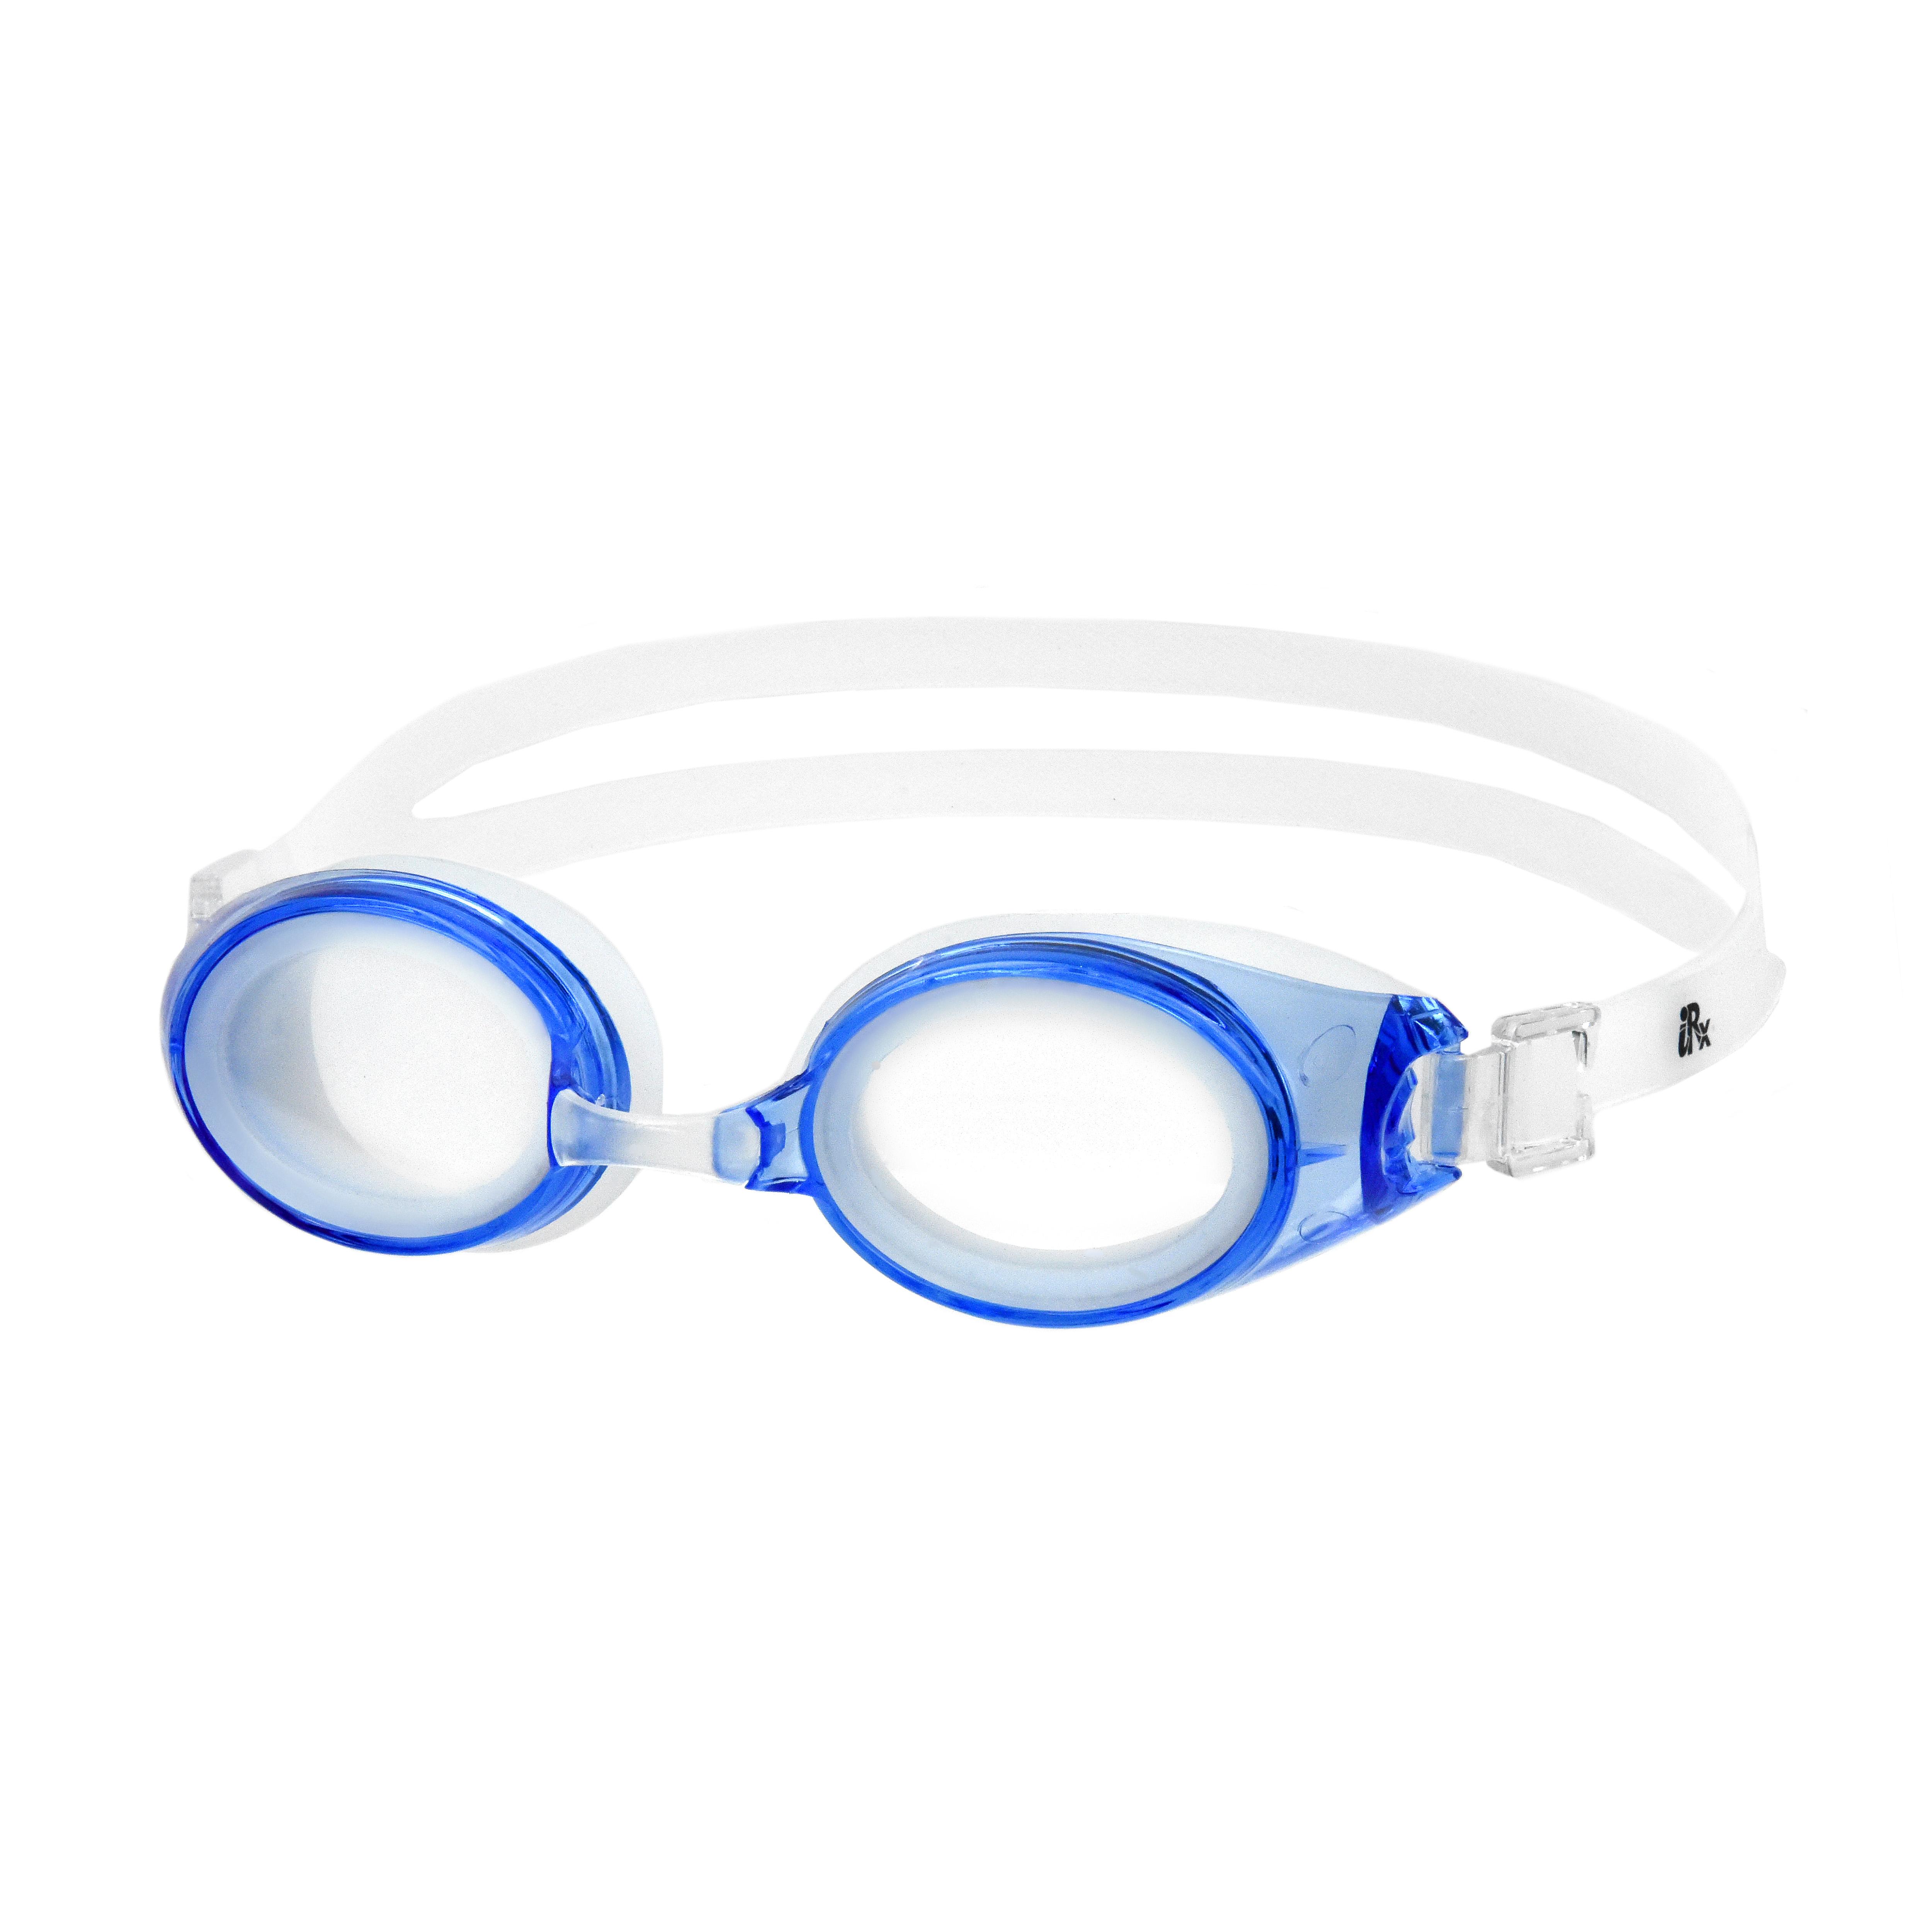 IRX Glazable Swimming Goggles